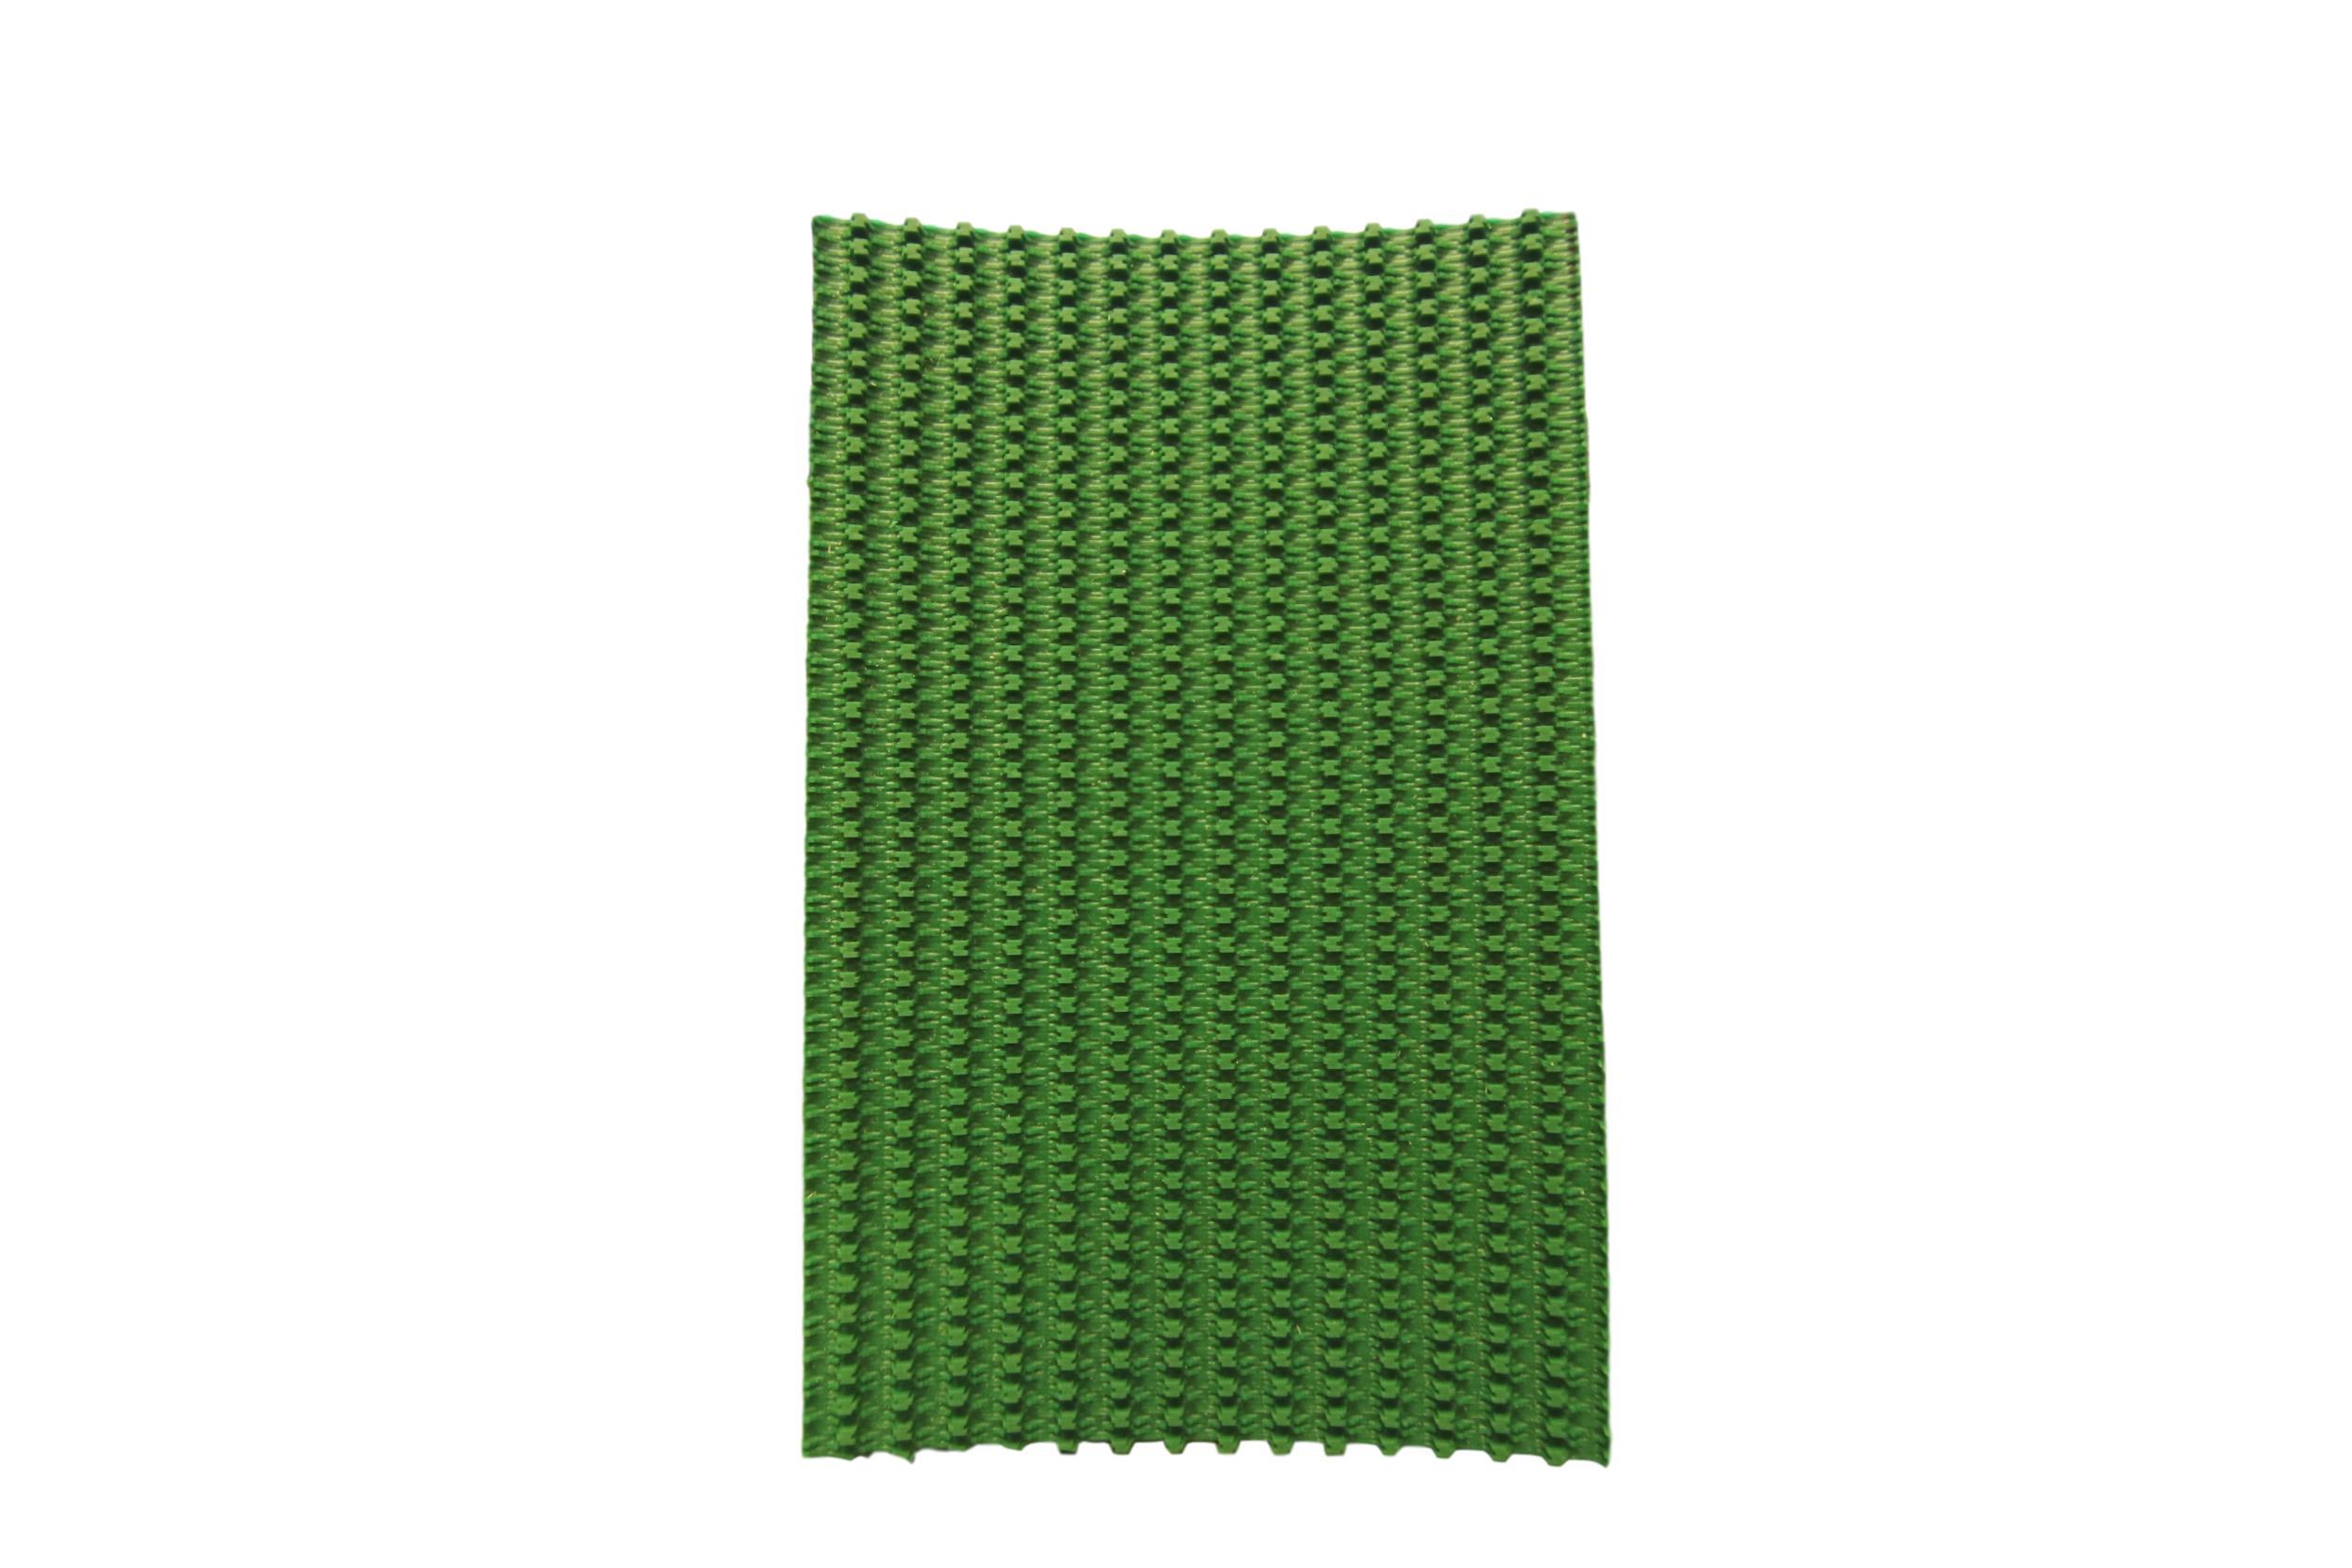 Conveyor Belting Green Grip Face 2 PLY Fabric Back 5.5mm